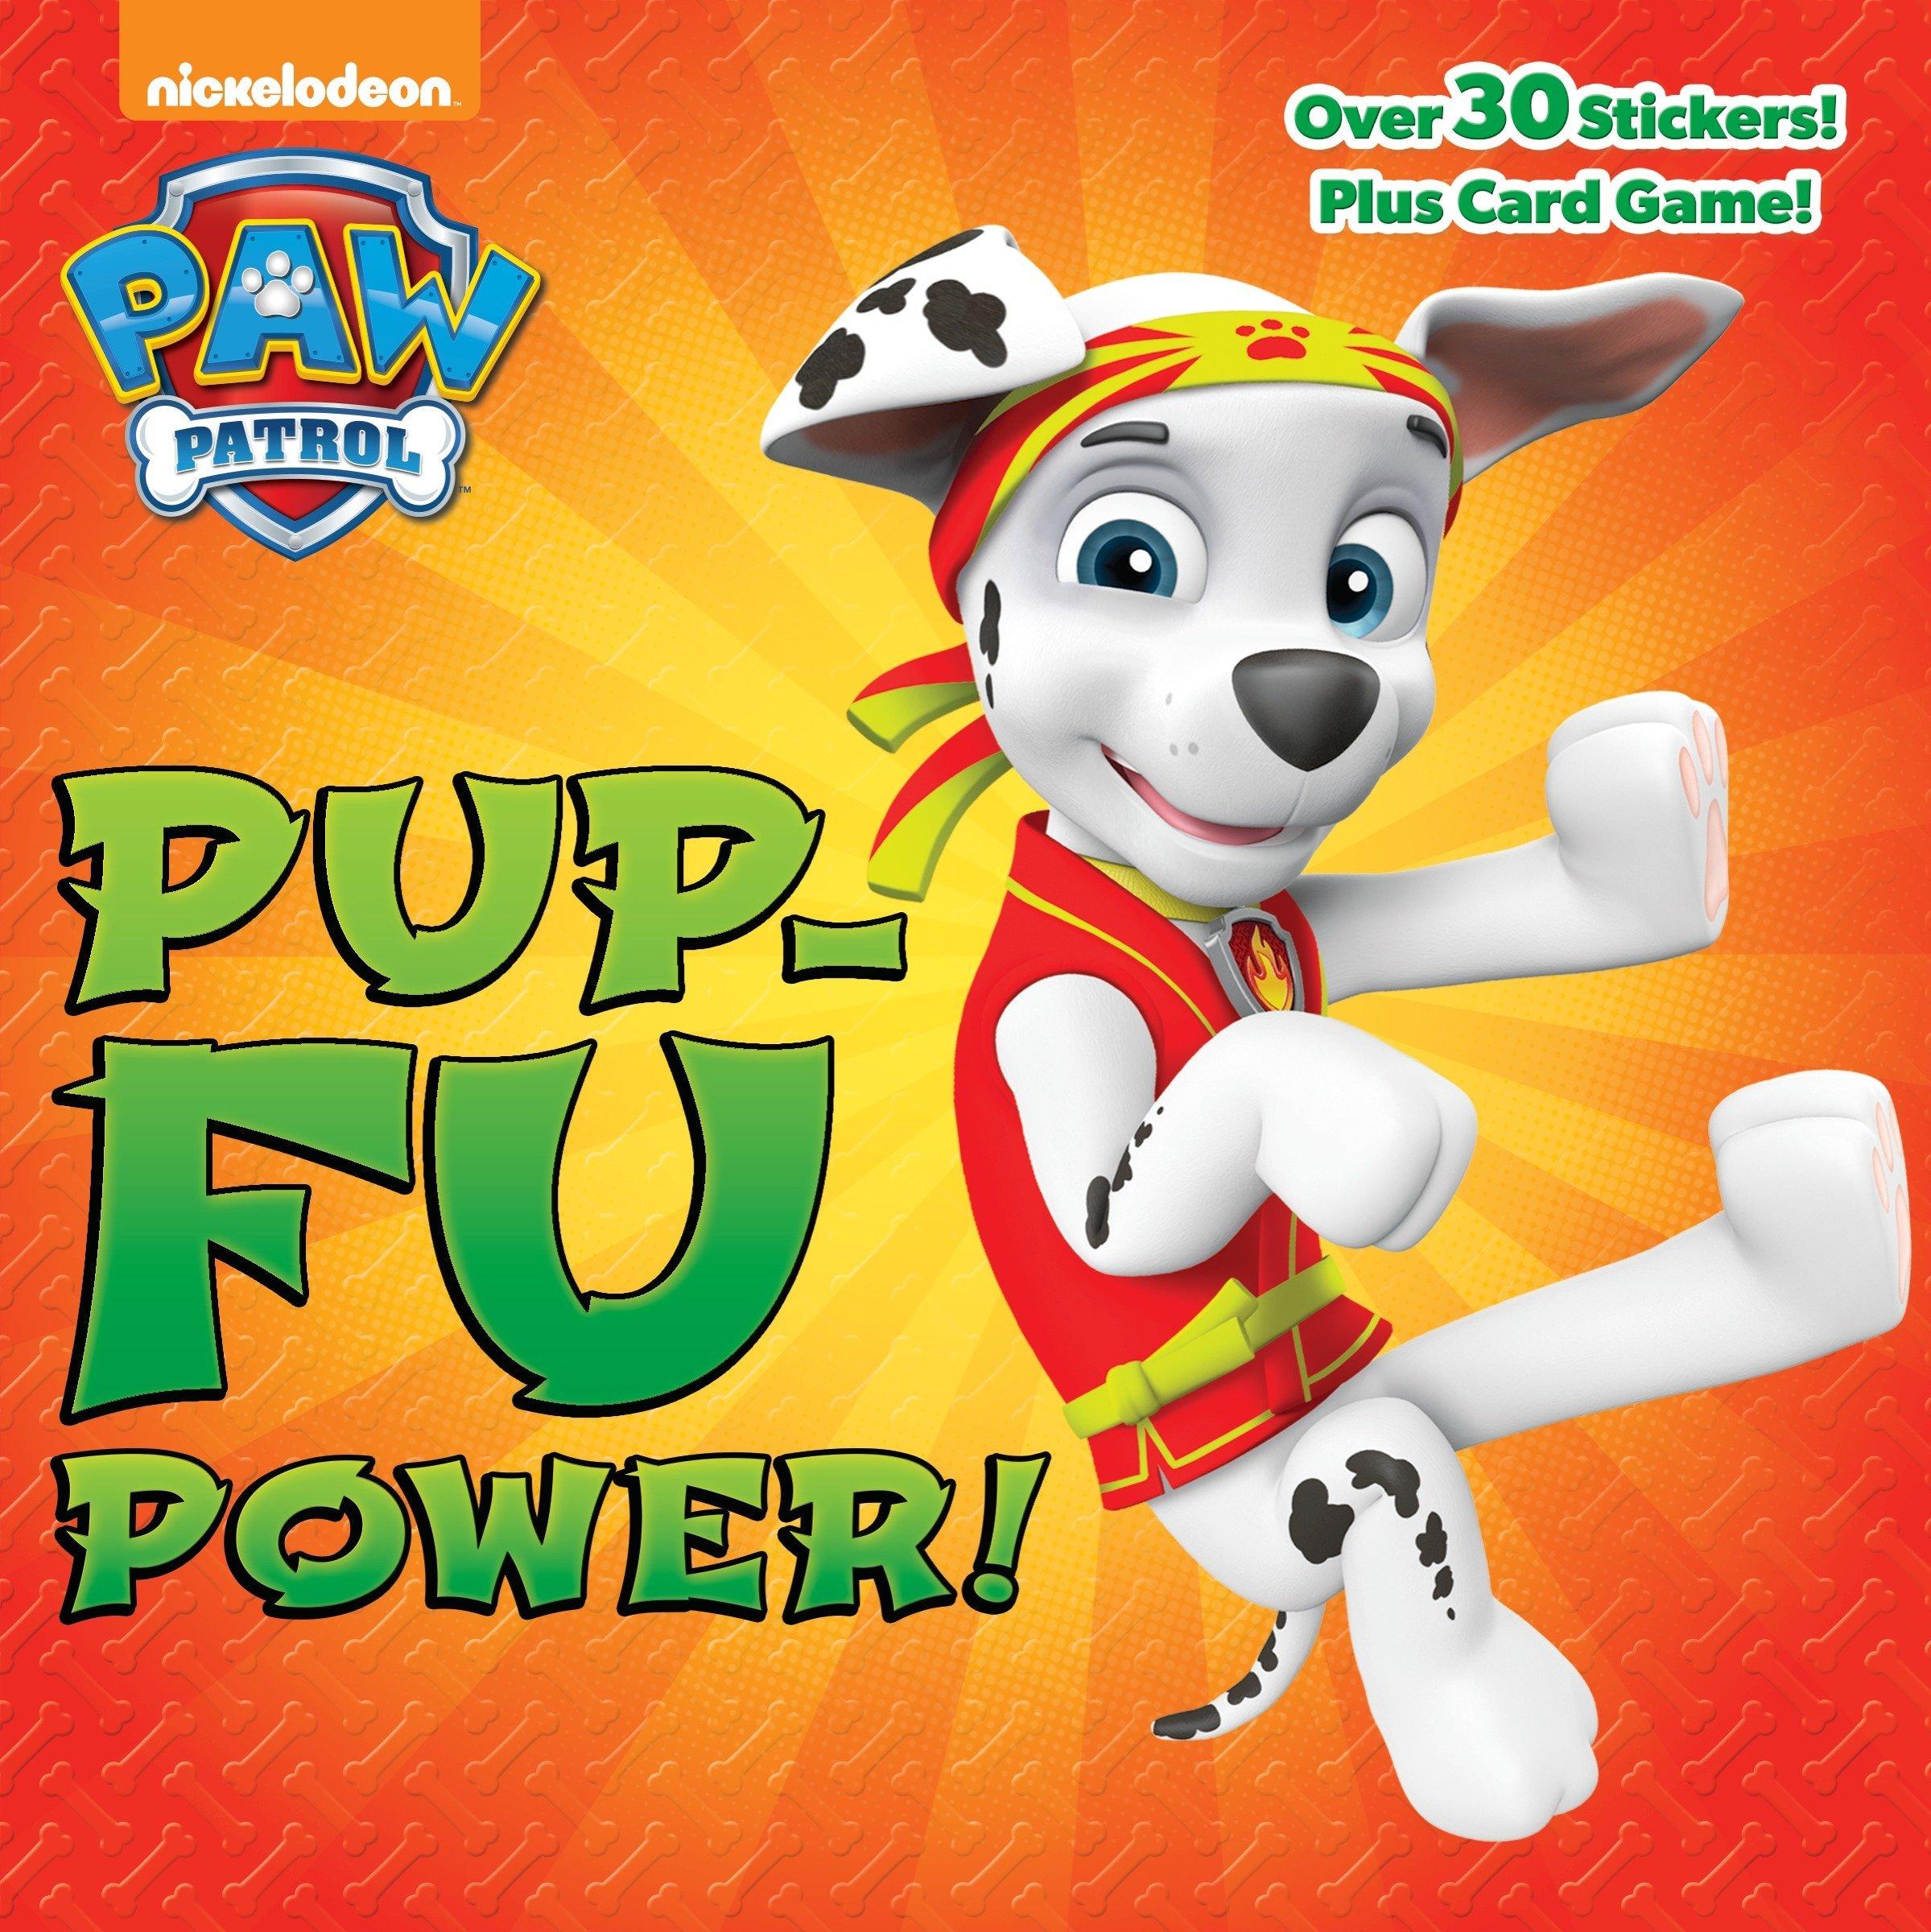 Pup-Fu Power! (PAW Patrol) (Pictureback(R))